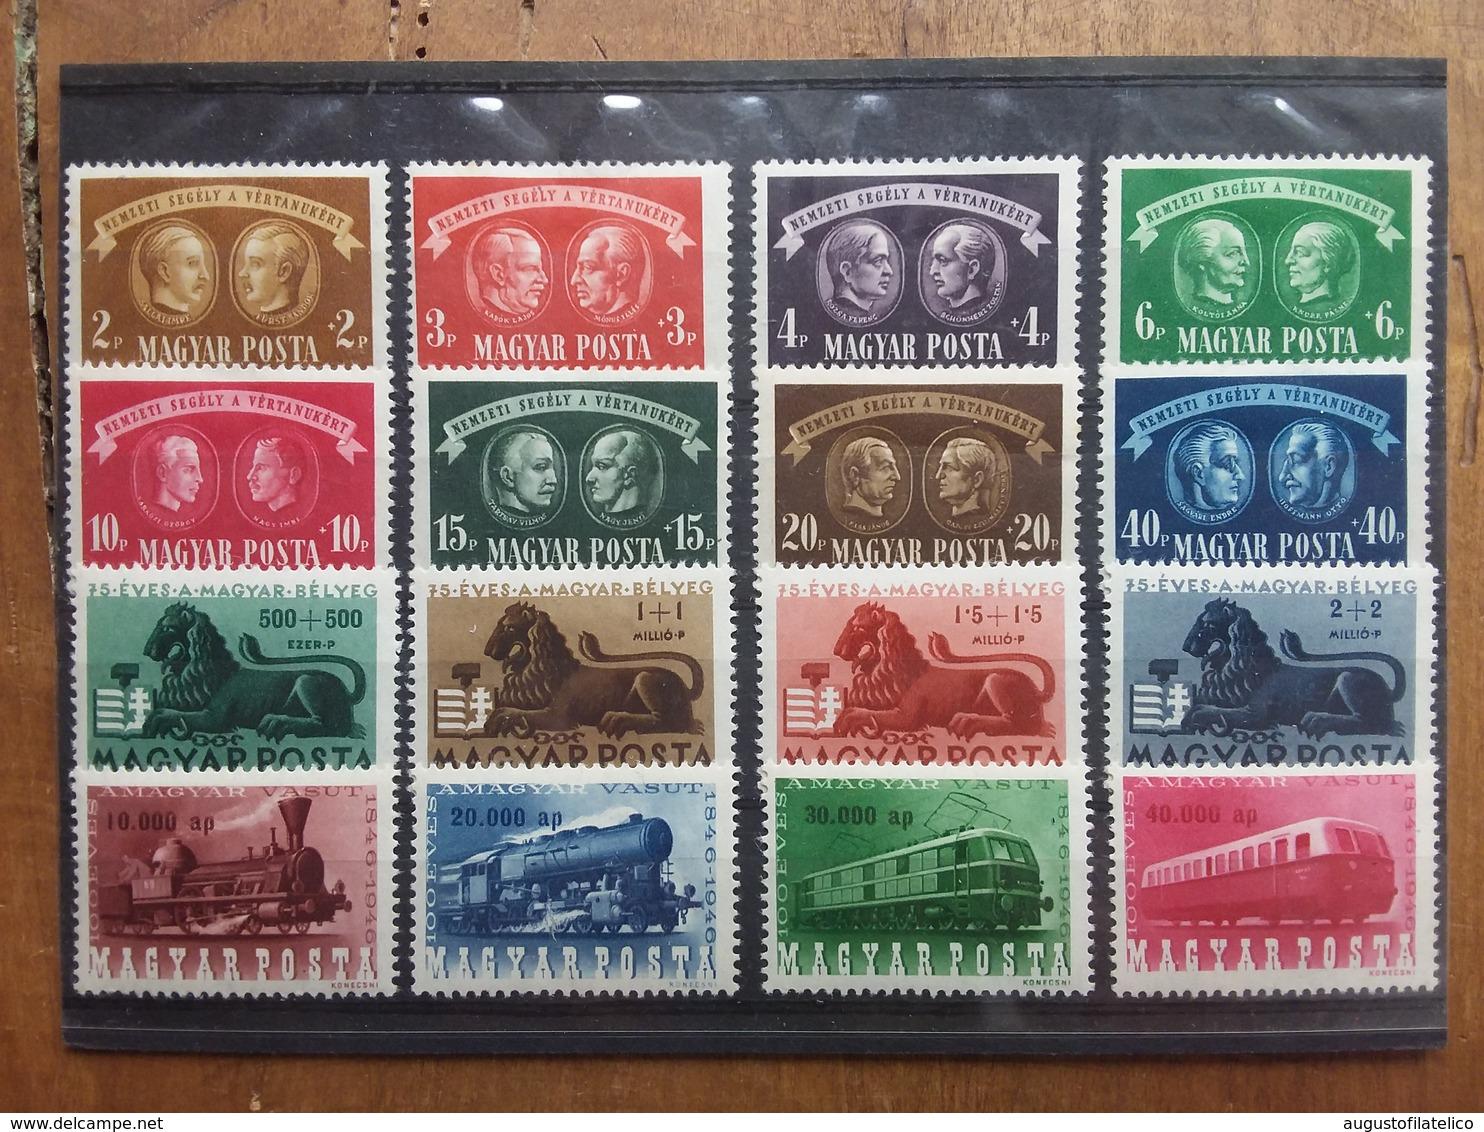 UNGHERIA Anni '40 - 3 Serie Complete Nuove * - Nn. 836/43 - 893/96 - 943/46 + Spese Postali - Ungheria